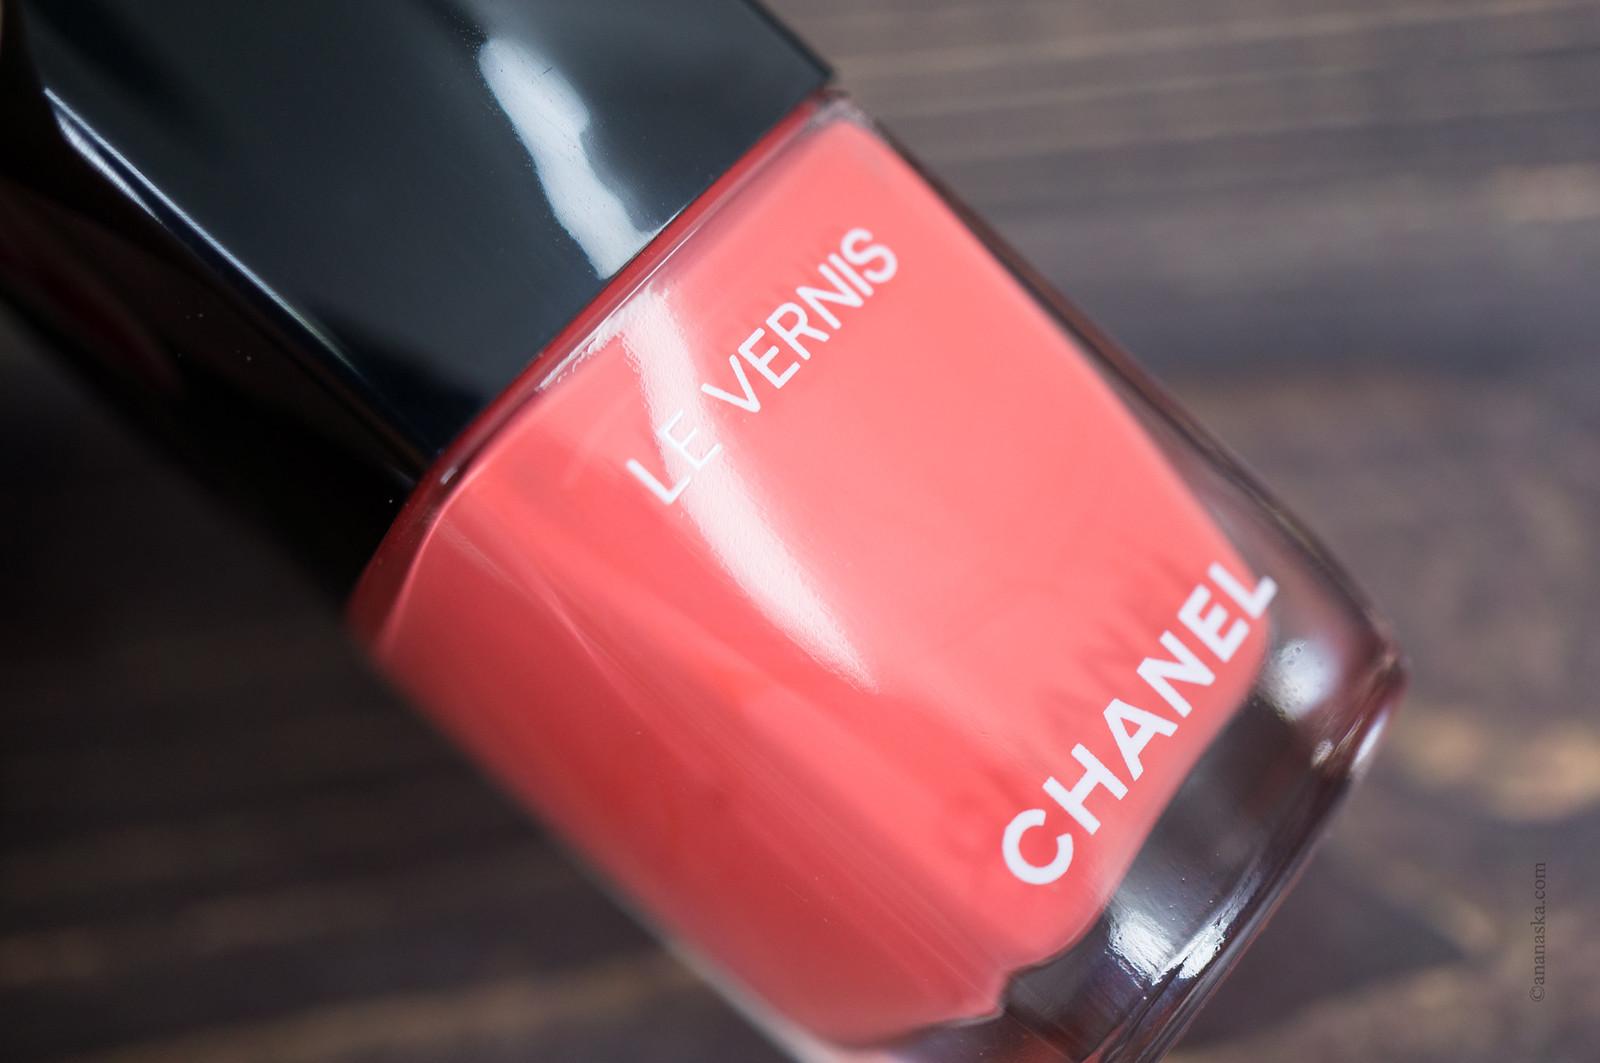 Chanel Le Vernis 562 Coralium